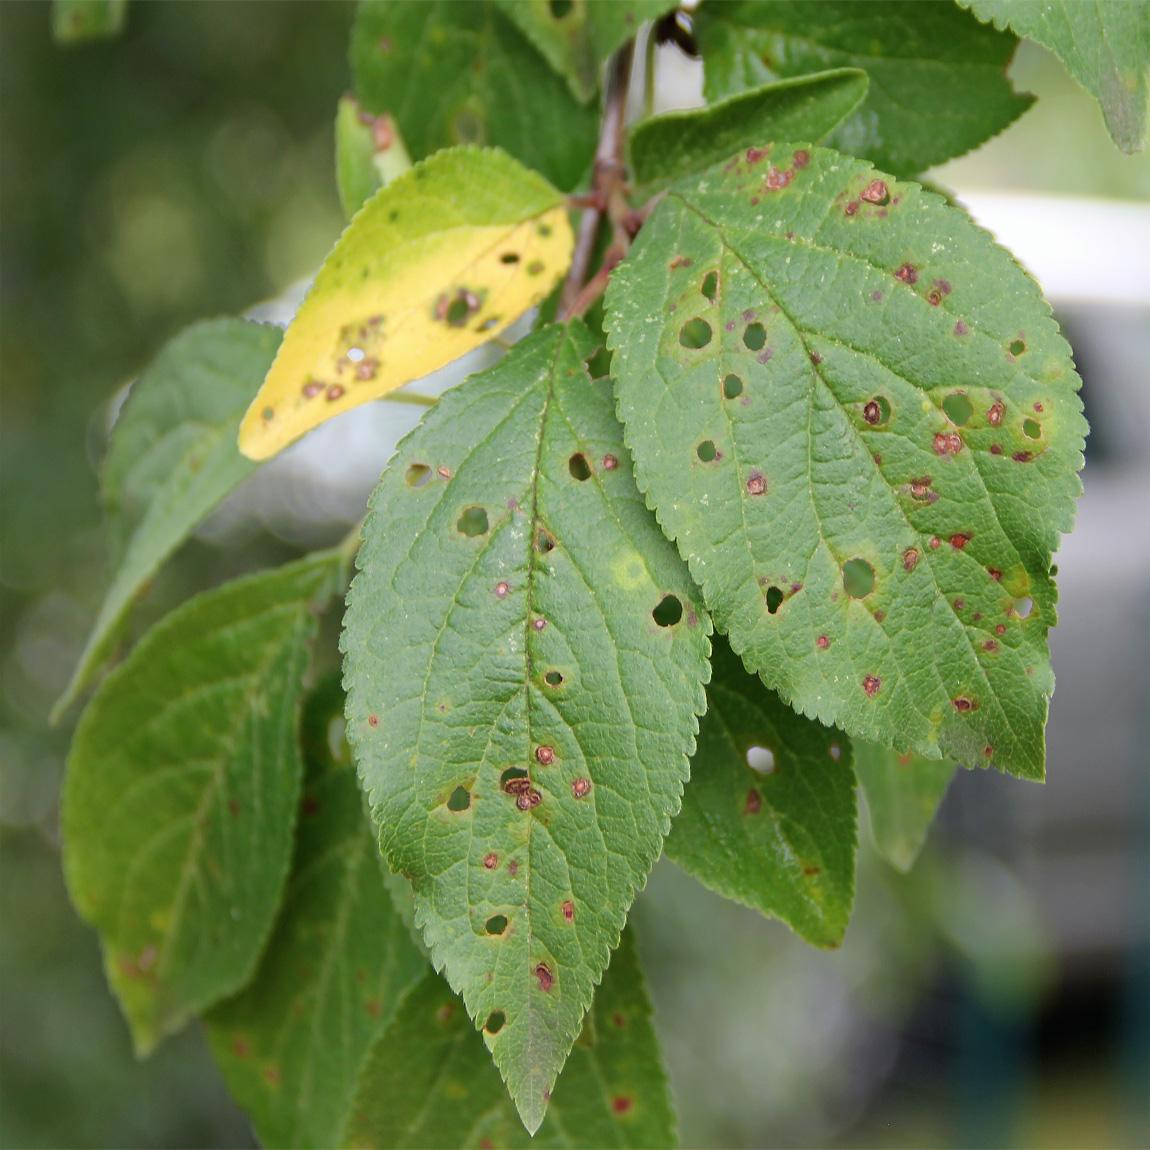 Shot Hole Disease on Cherry Leaves